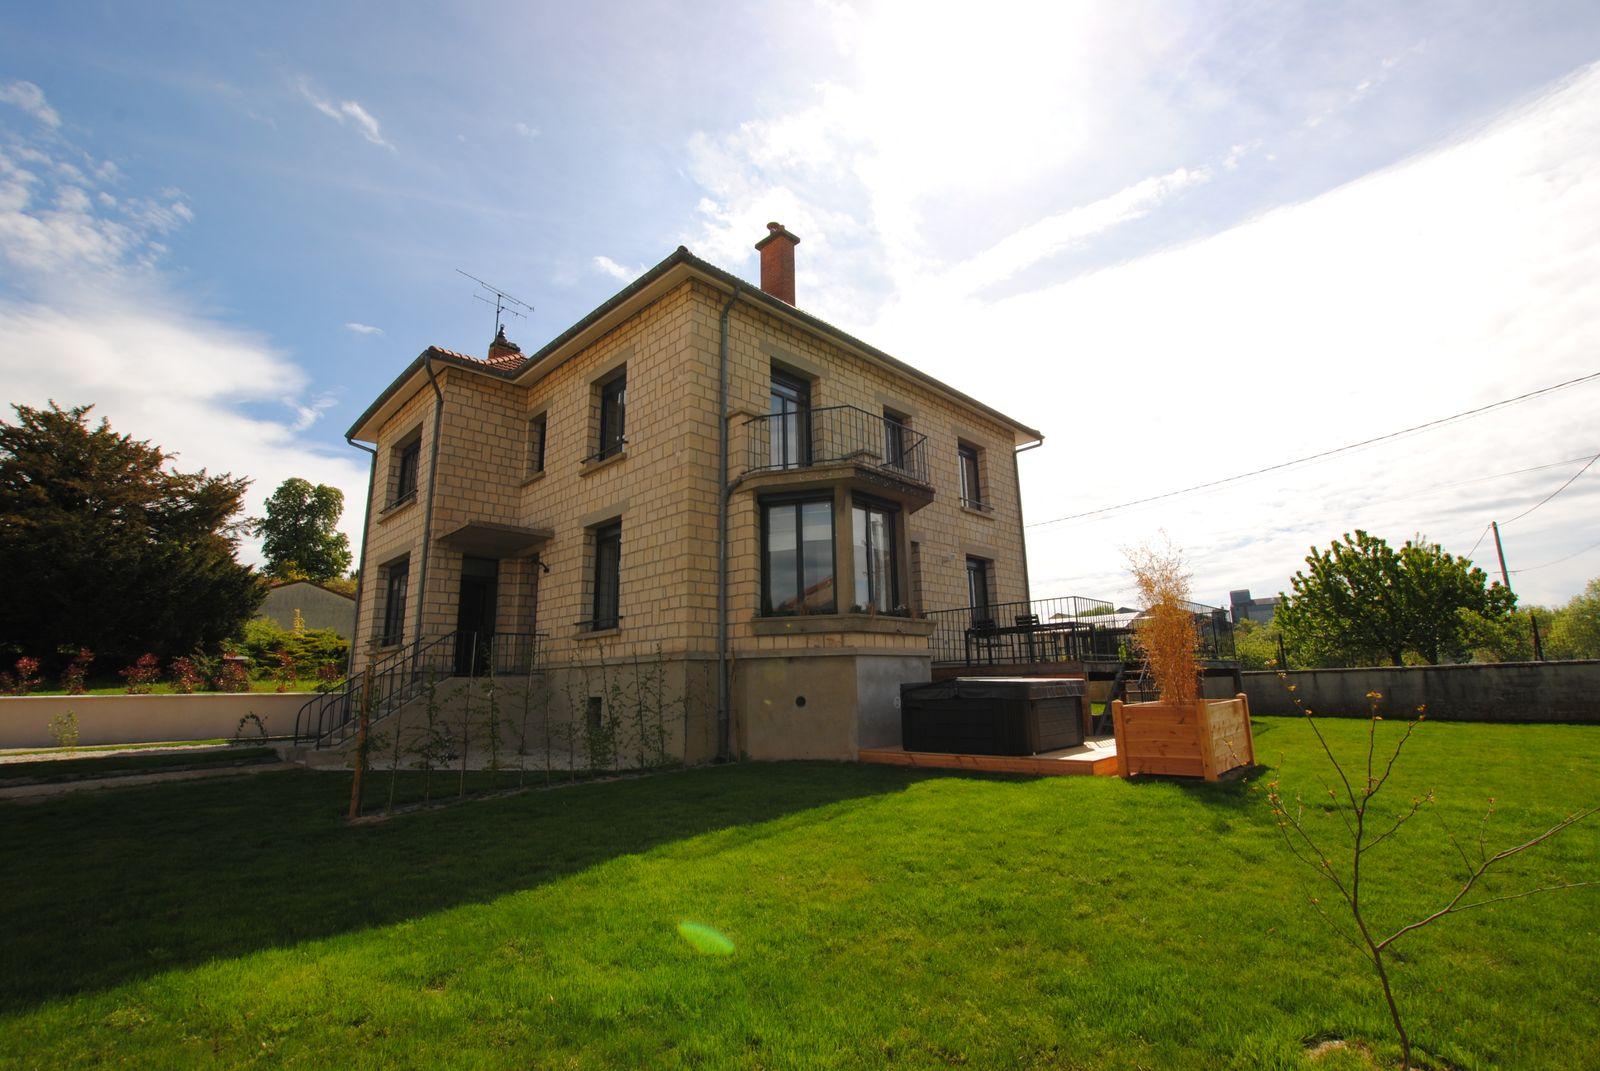 51G494 - Pogny - La Maison Gabriel